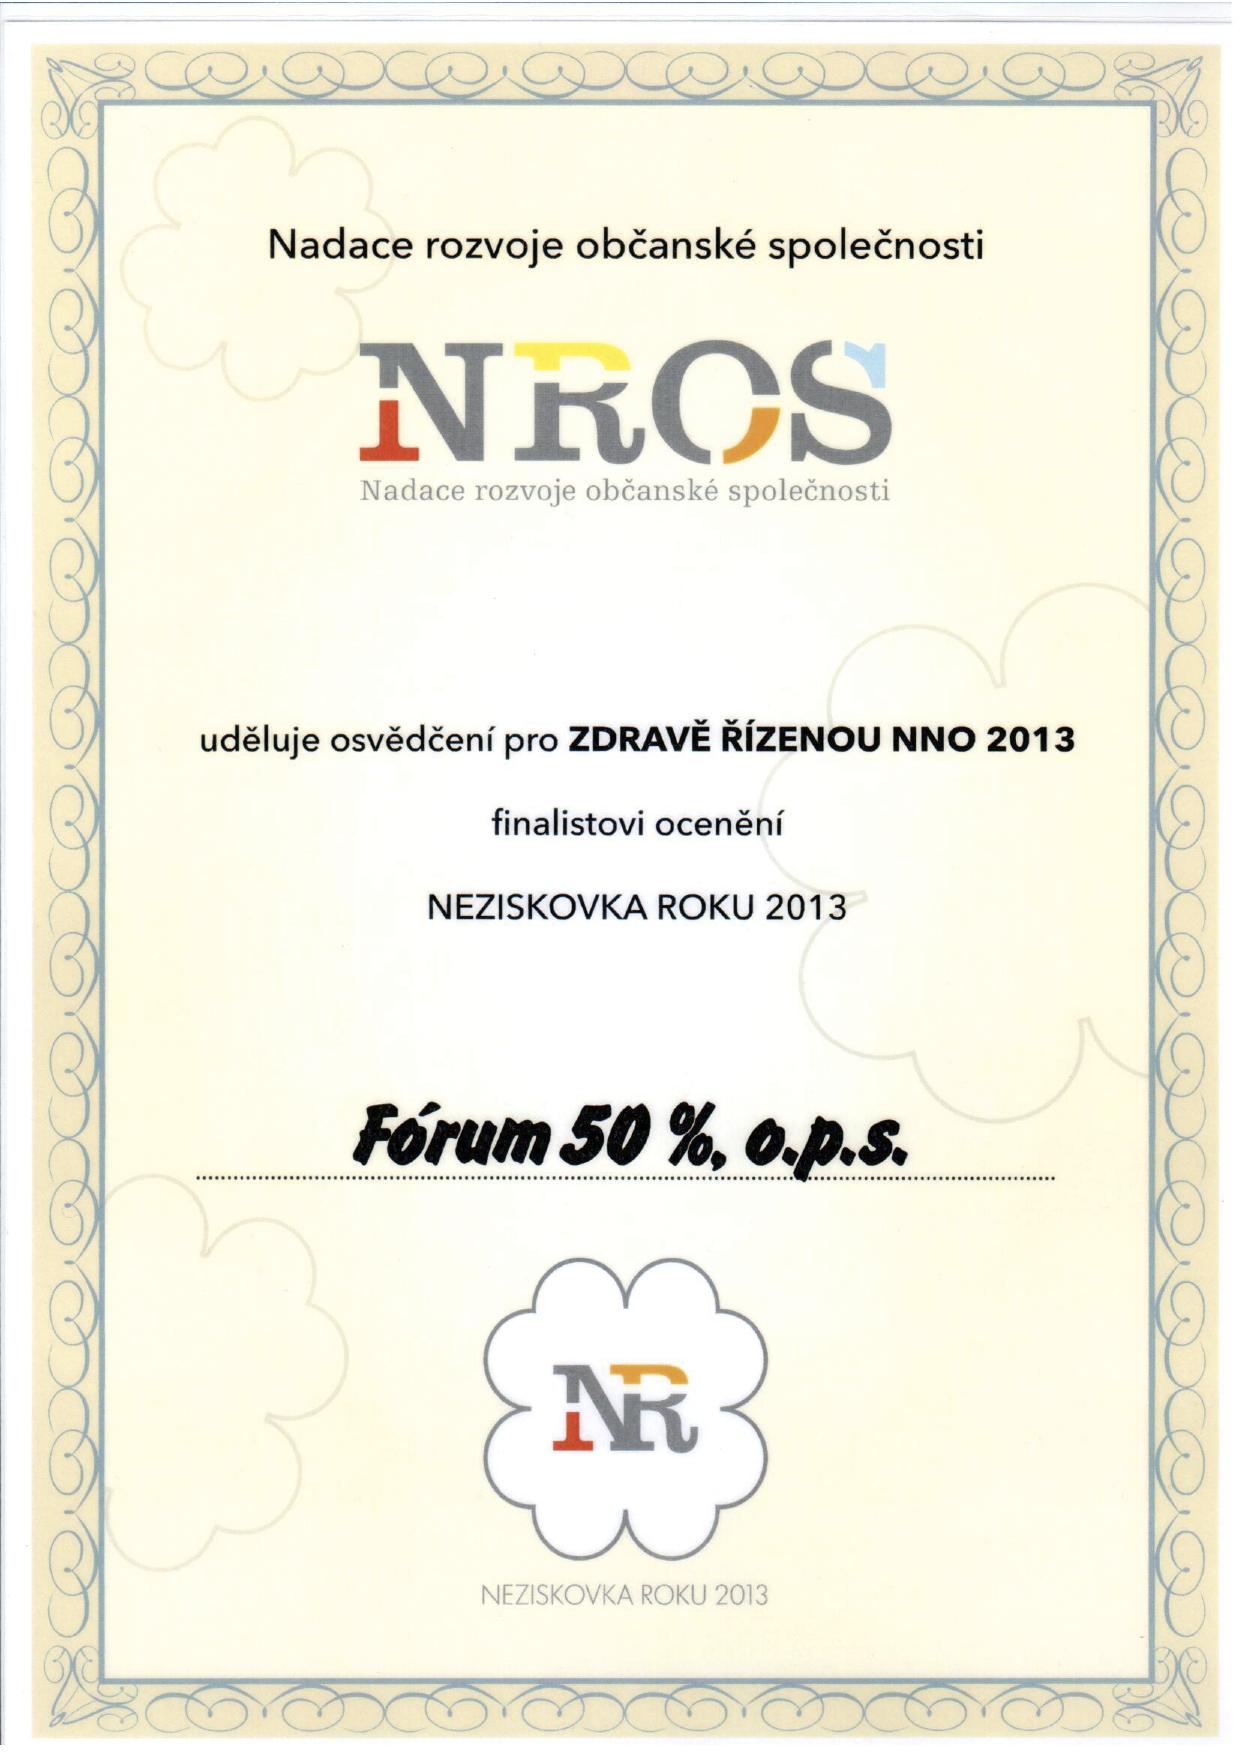 zdrave-rizena-nno-2013.png